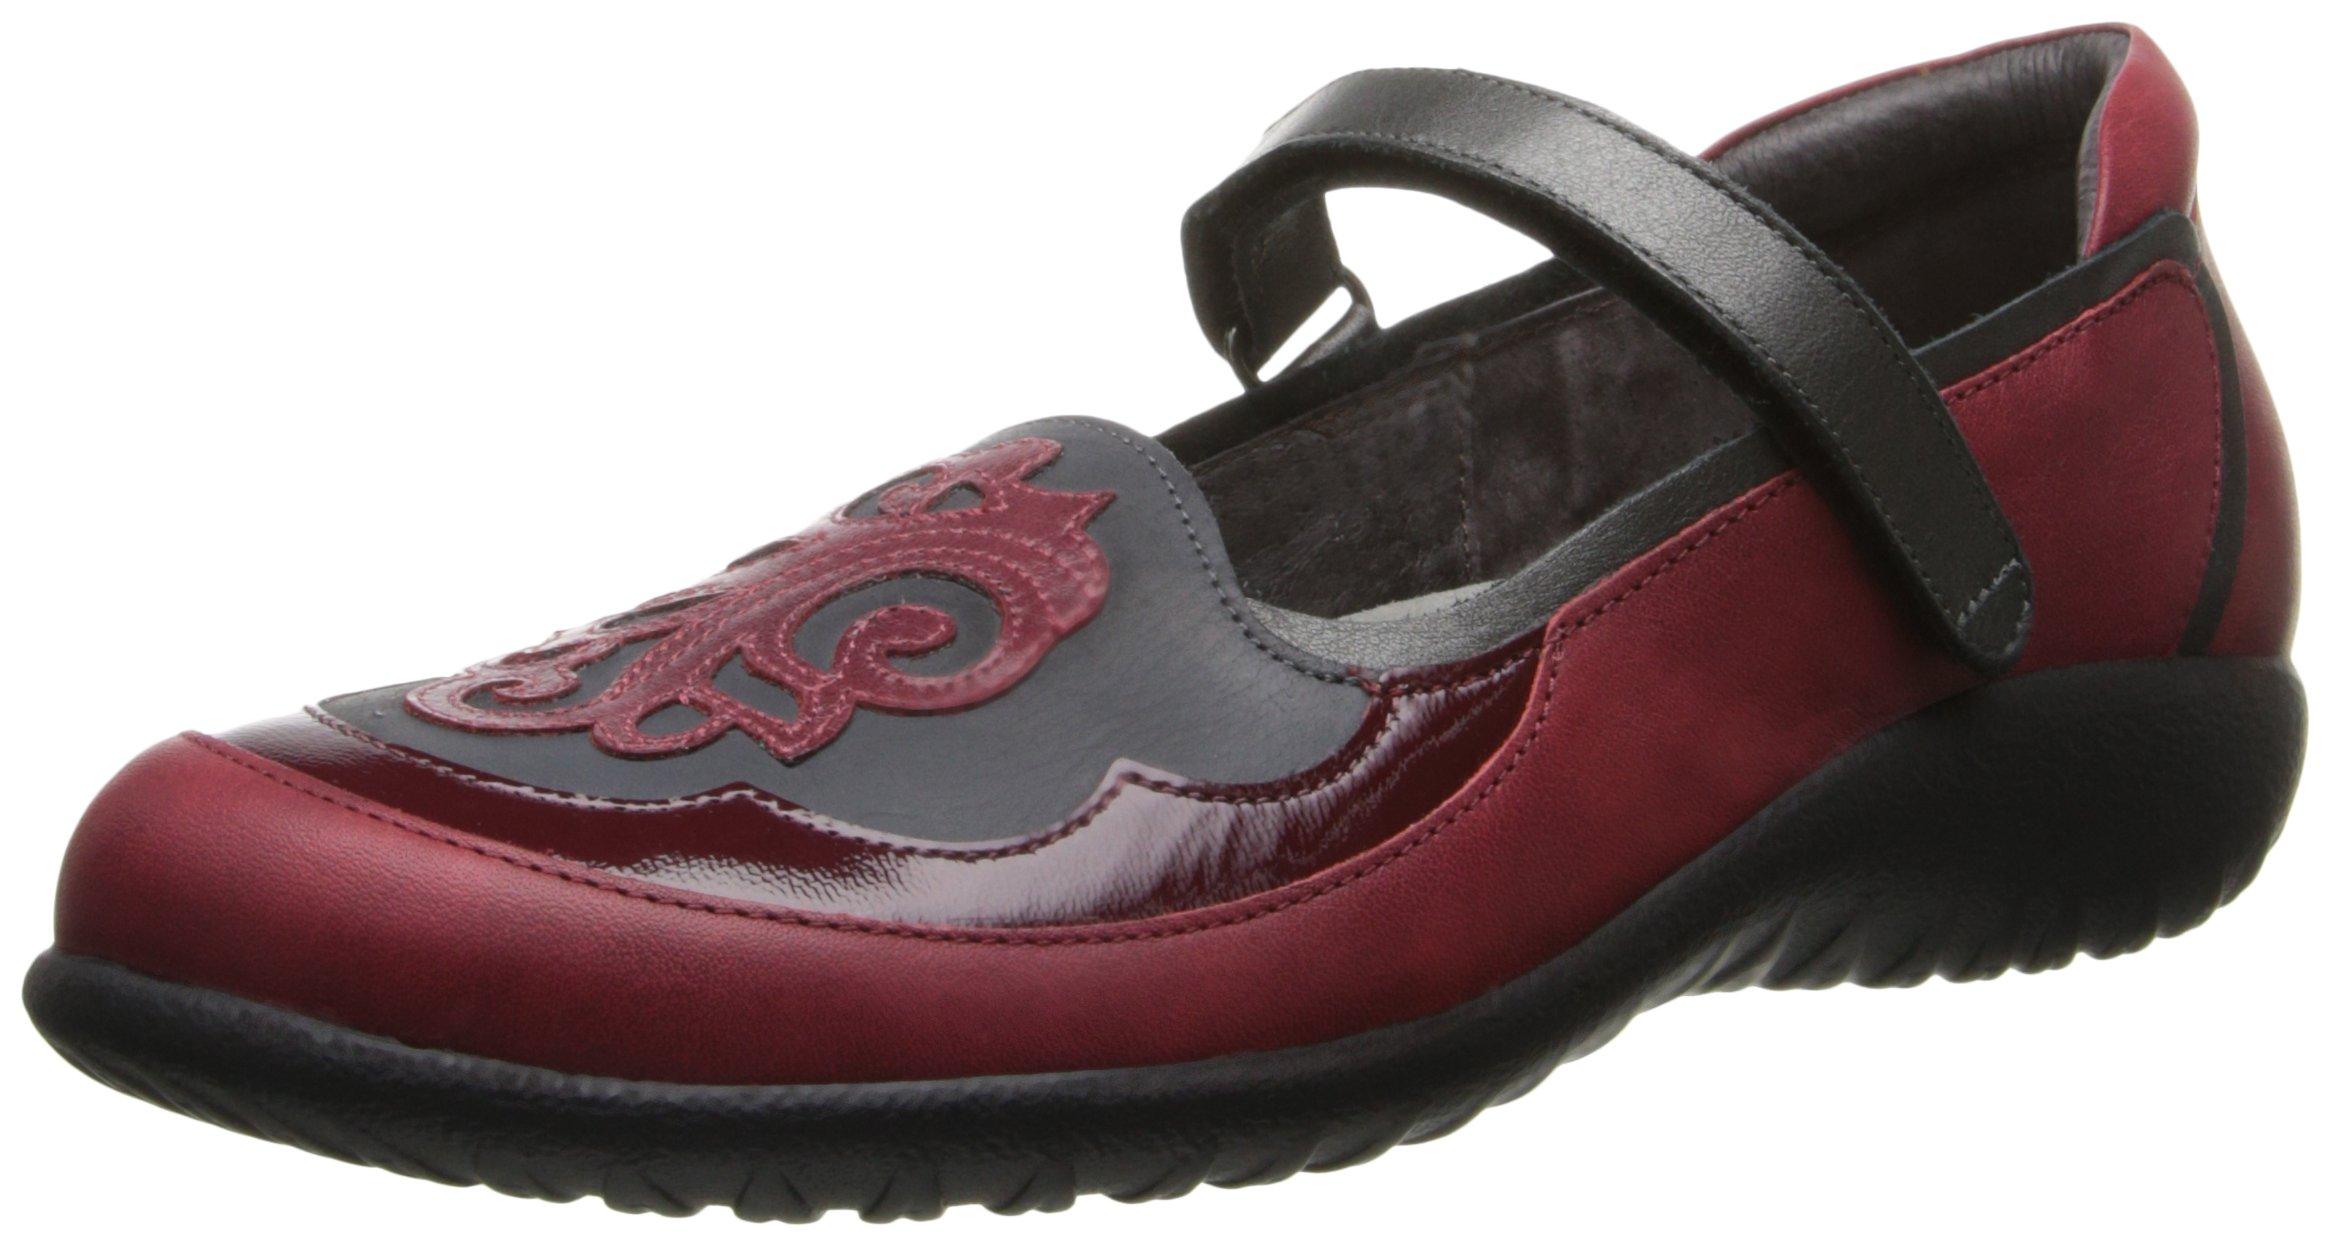 Naot Women's Motu Mary Jane Flat, Berry Leather/Black Leather/Beet Red Patent, 42 EU/10.5-11 M US